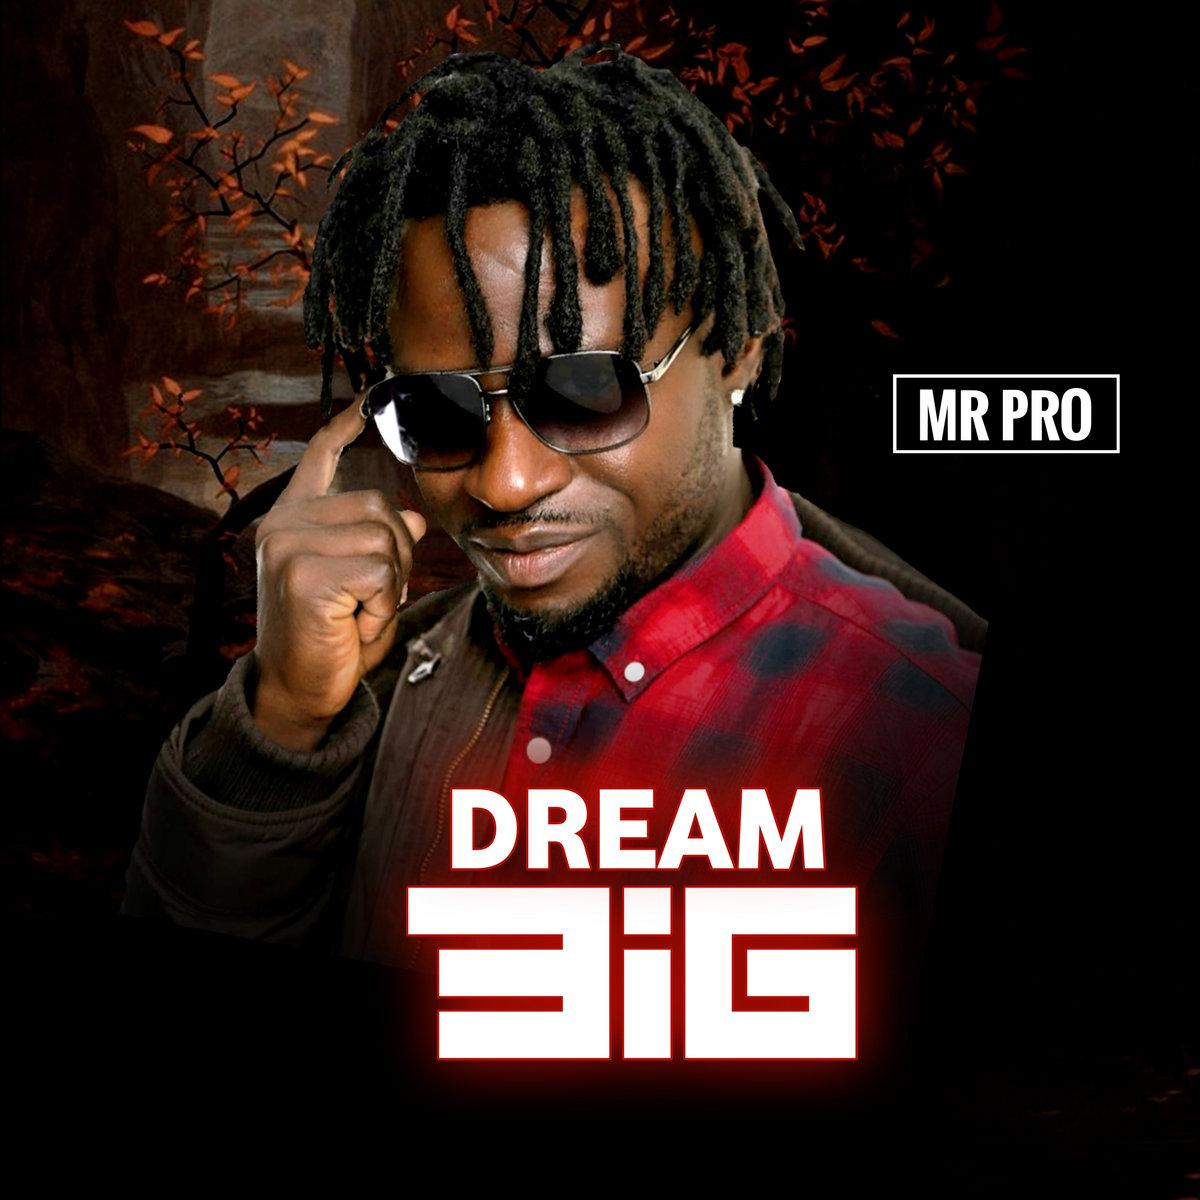 Dream Big by Mr PRO